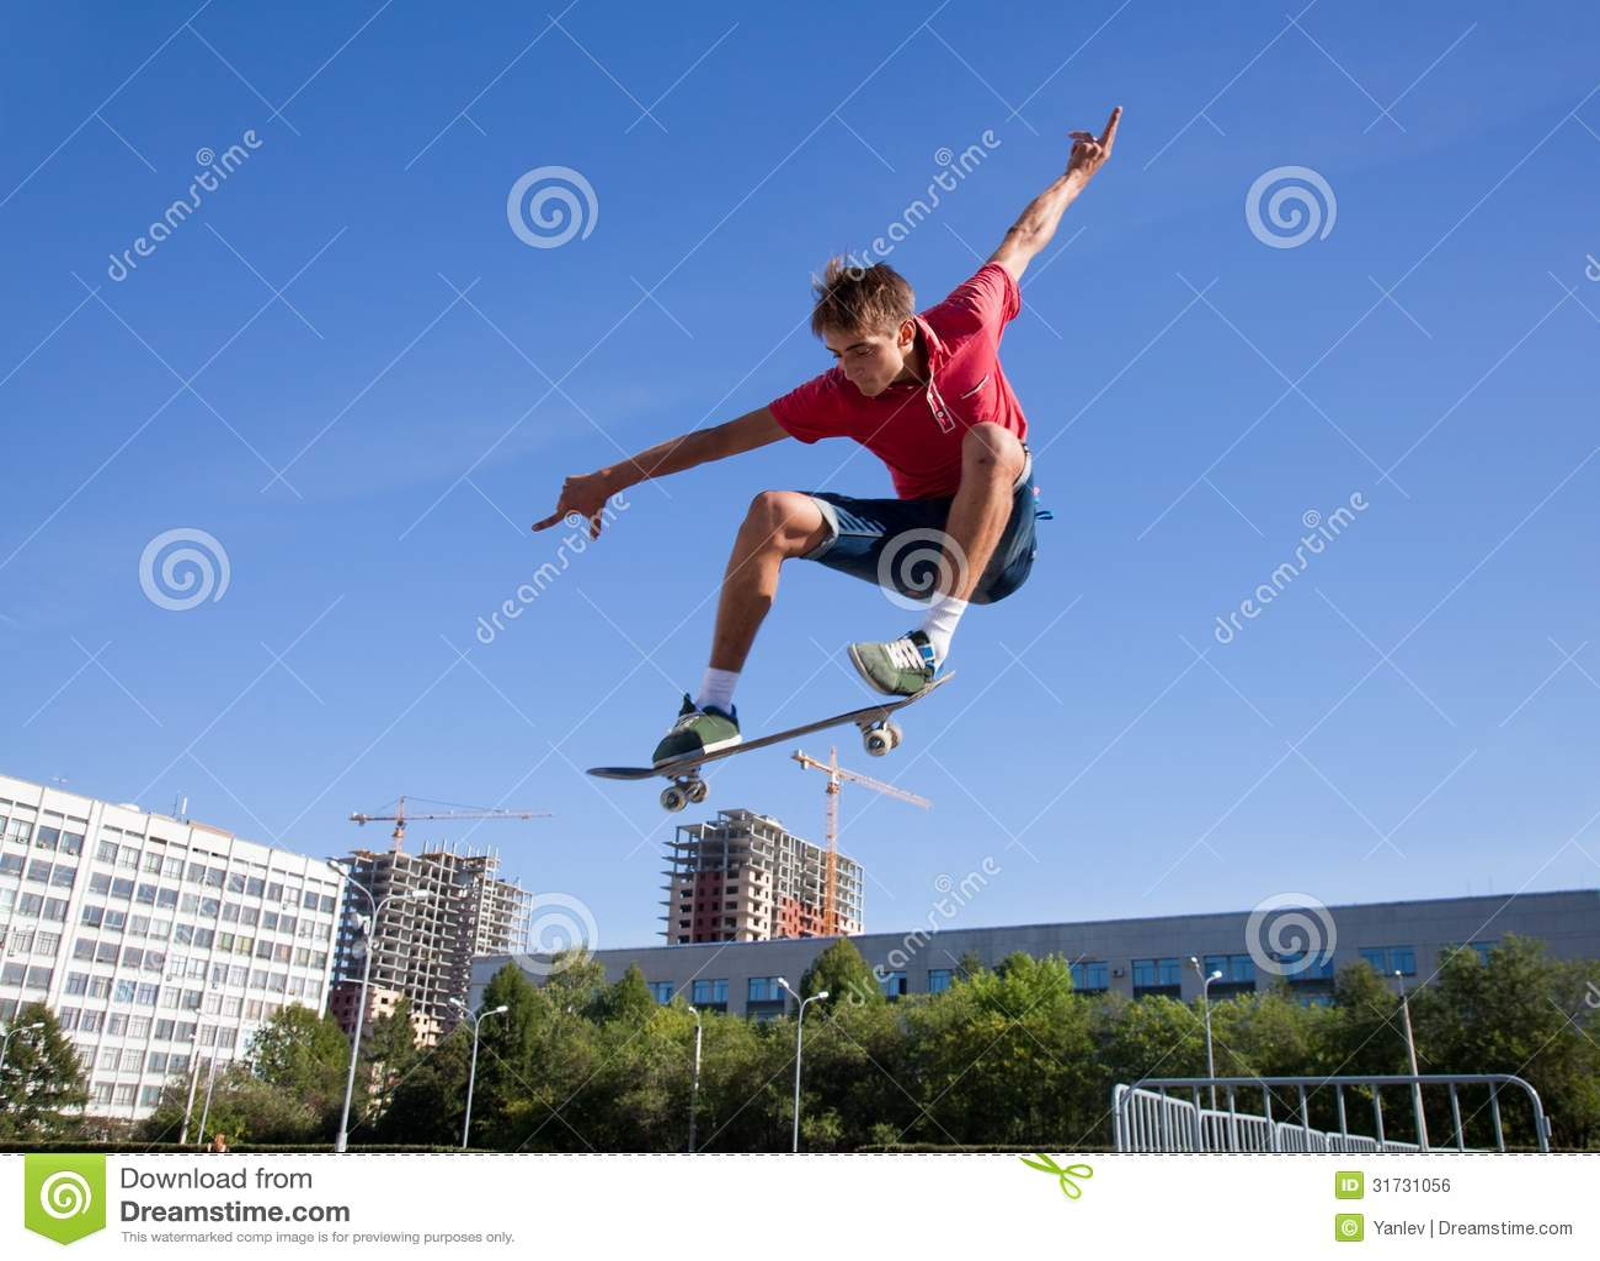 Jump on skateboard stock photo. Image of jump, exercising ...